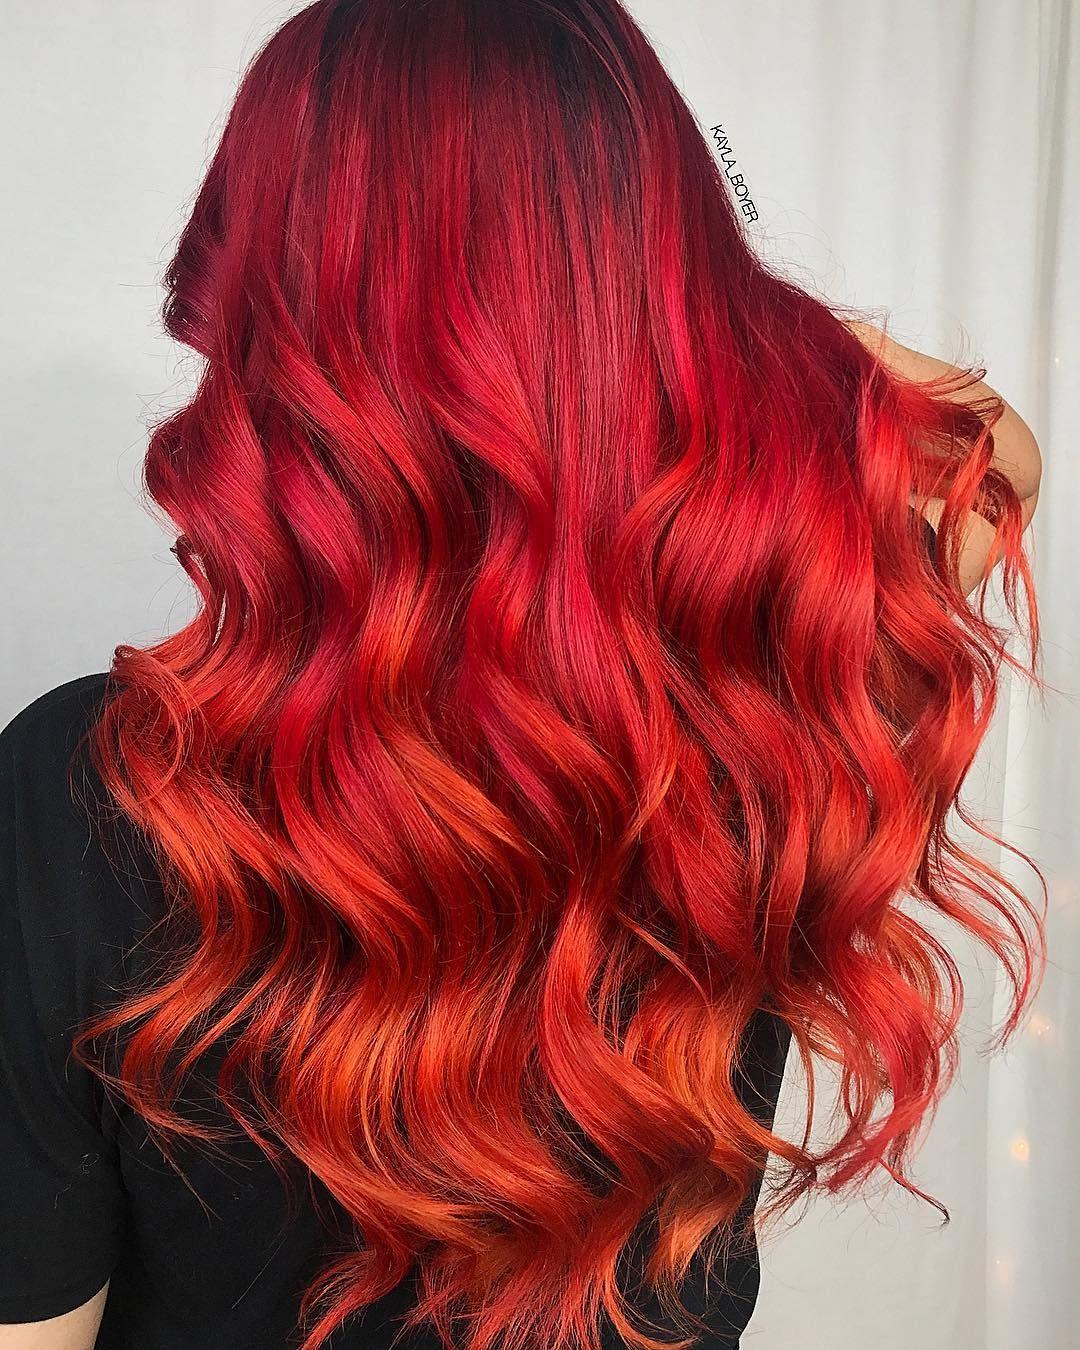 Hair u makeup by kayla boyer kaylaboyer sur instagram